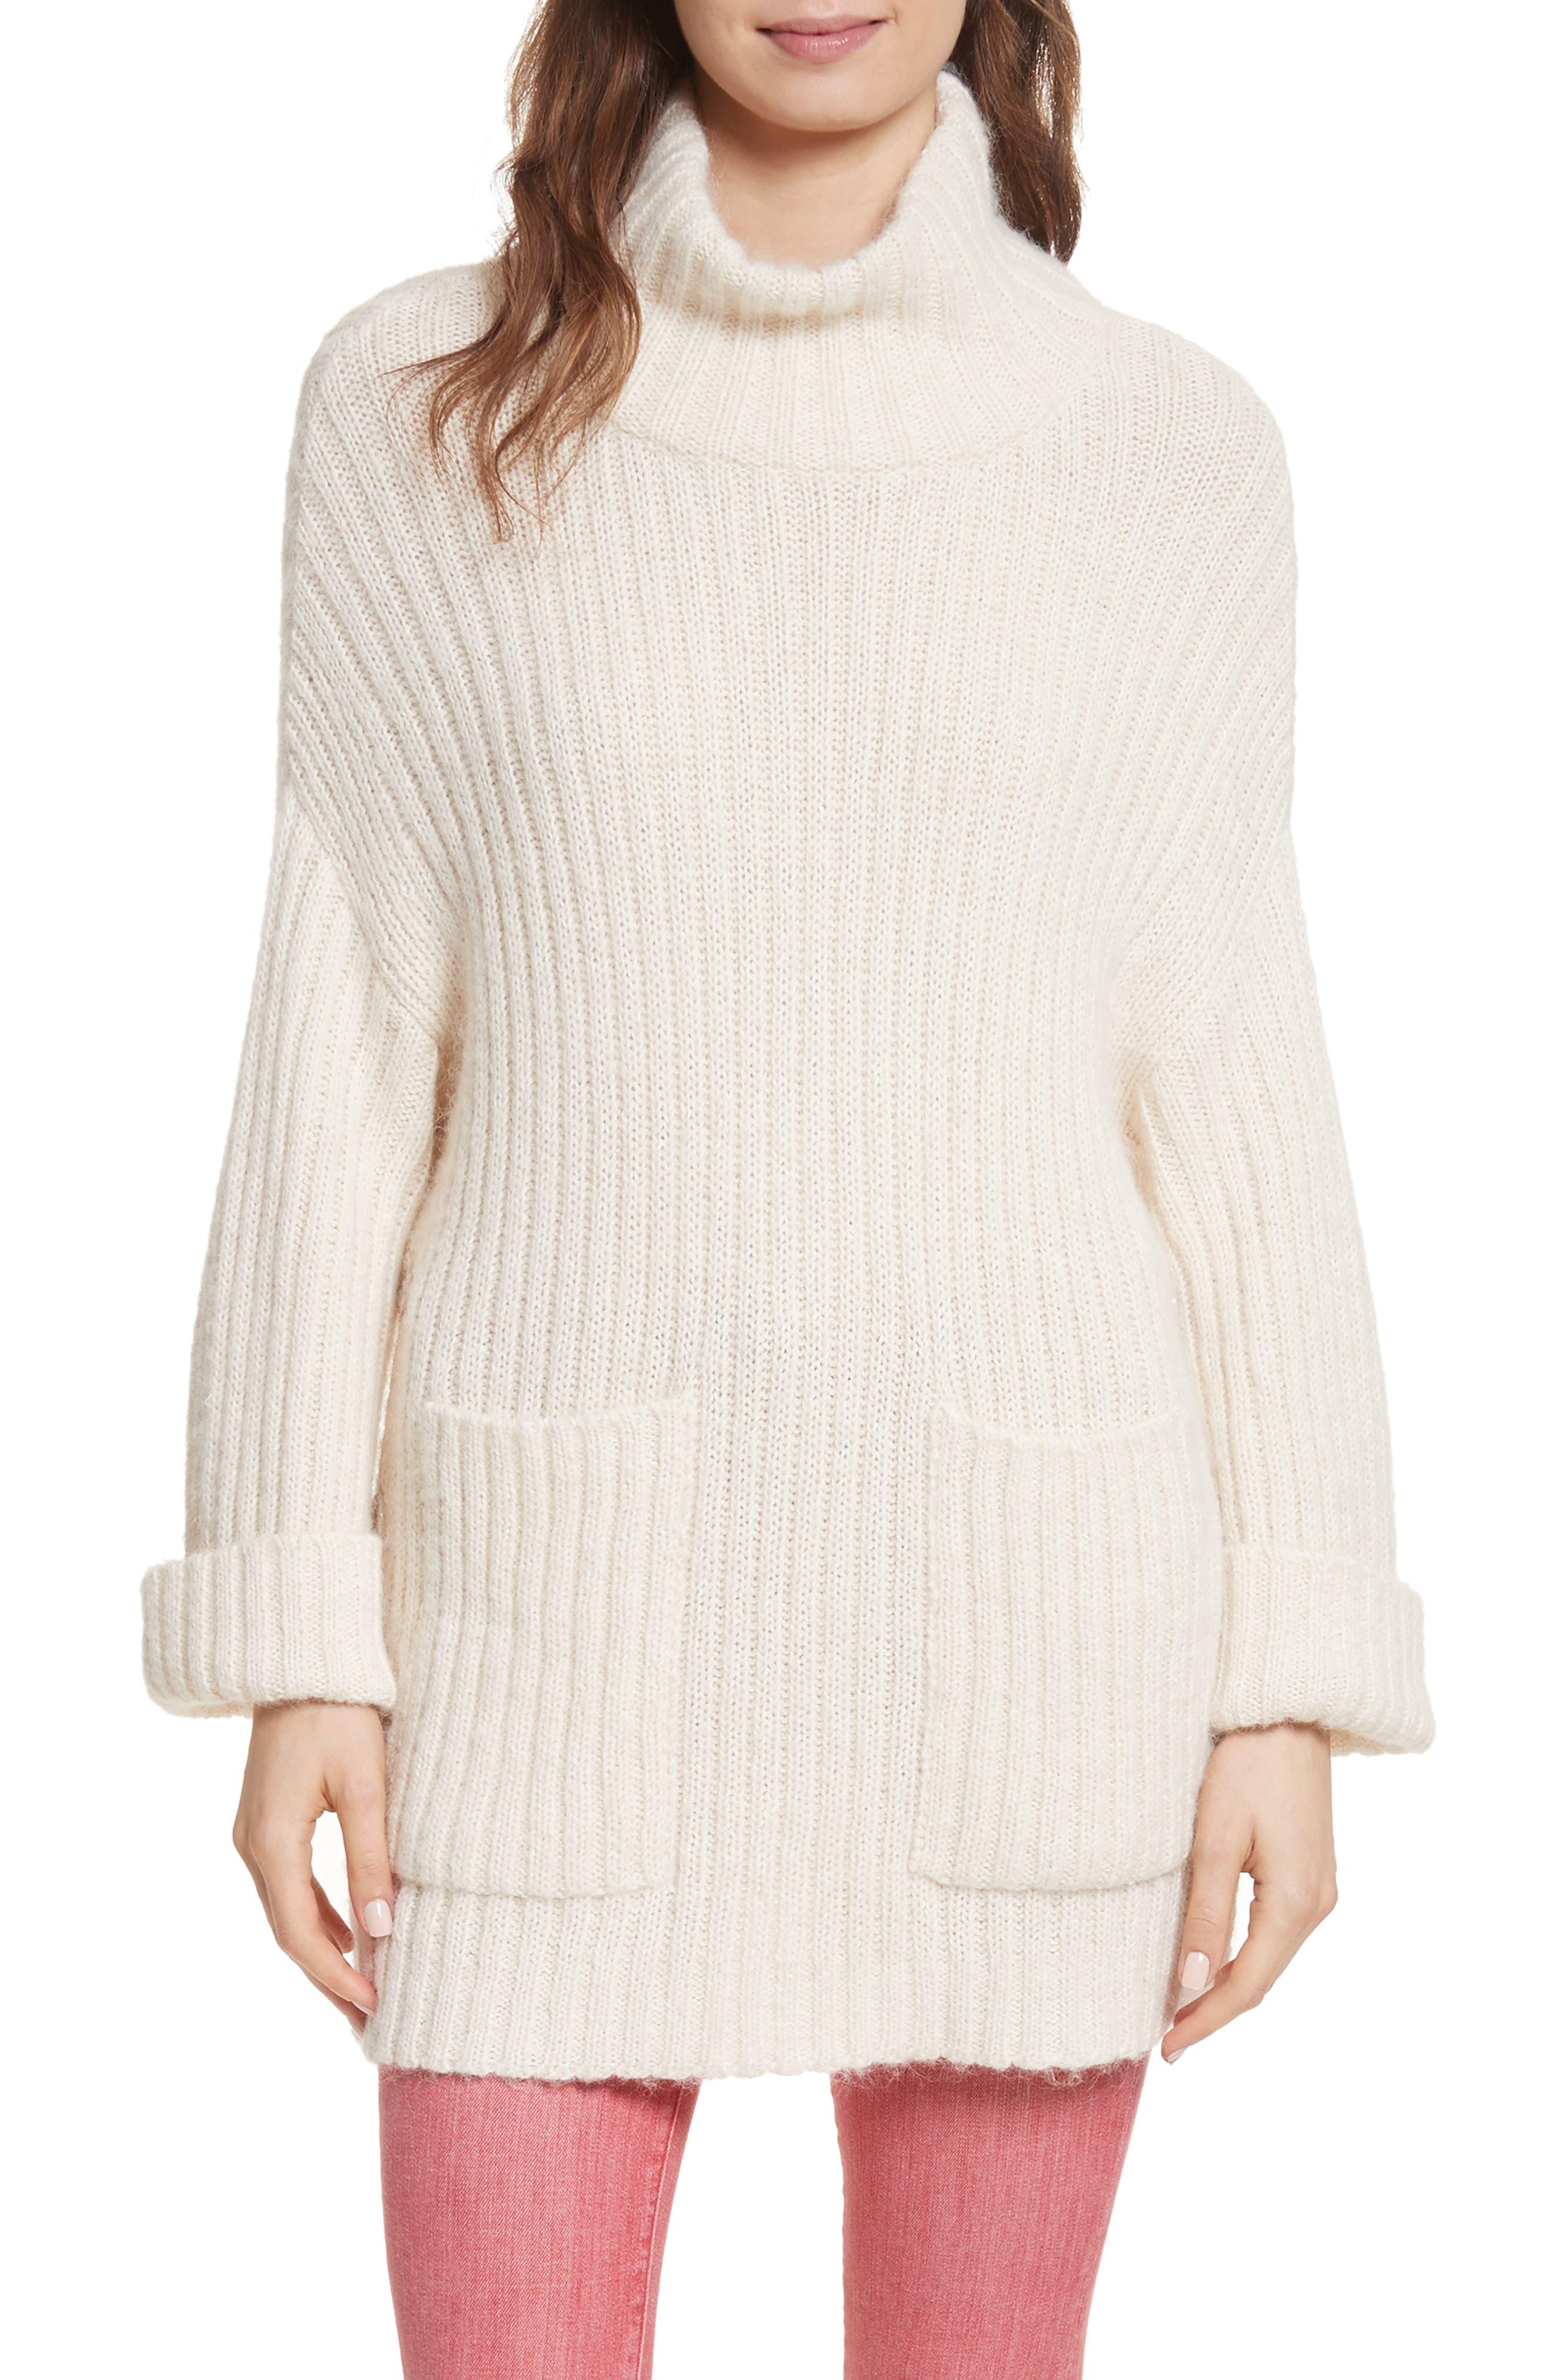 Banain Turtleneck Sweater,                             Main thumbnail 1, color,                             114